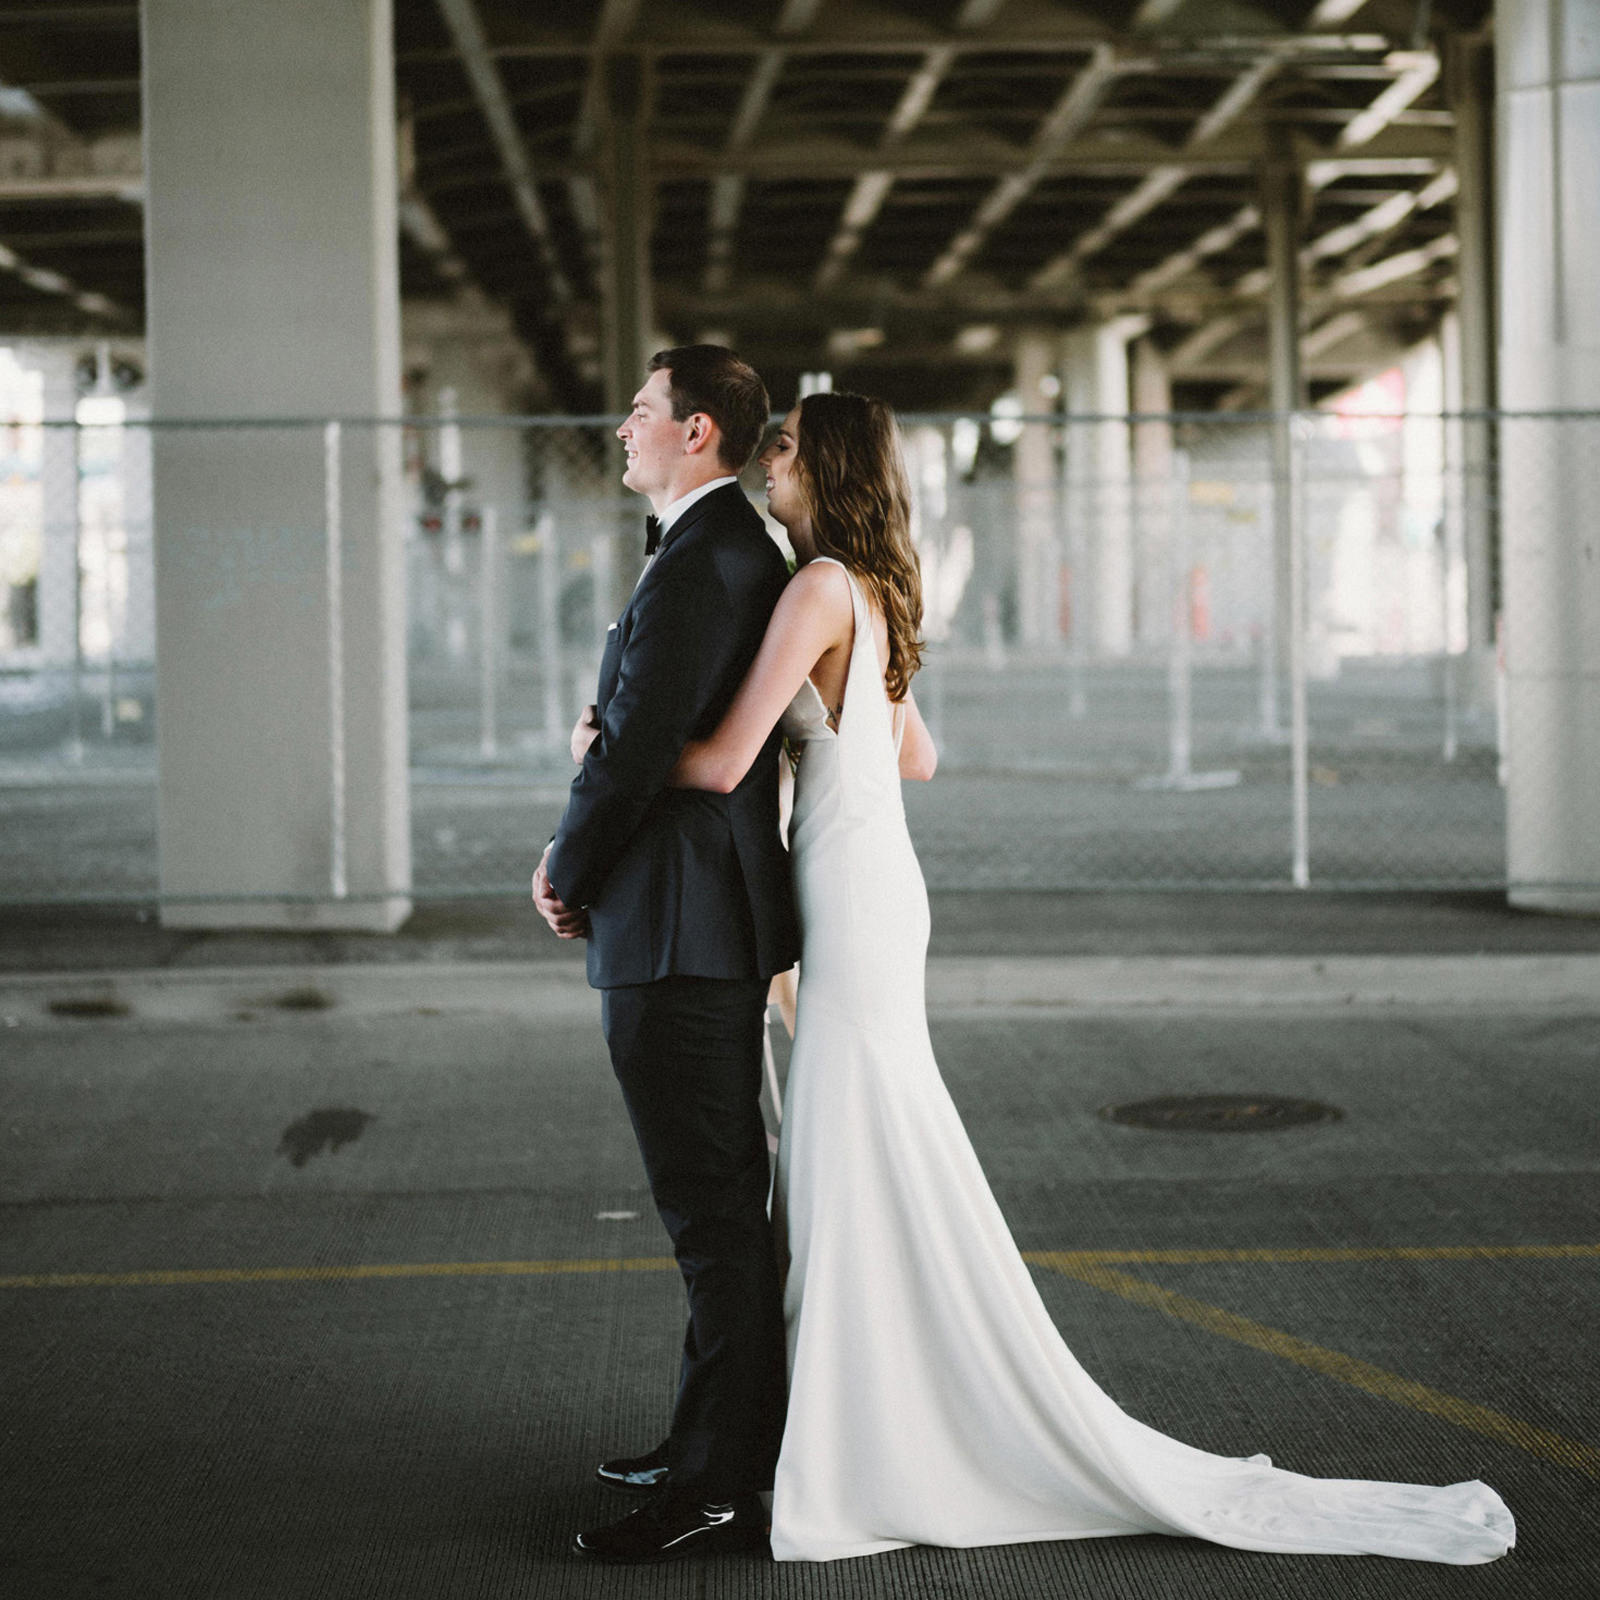 sodo-park-wedding-013 SODO PARK WEDDING